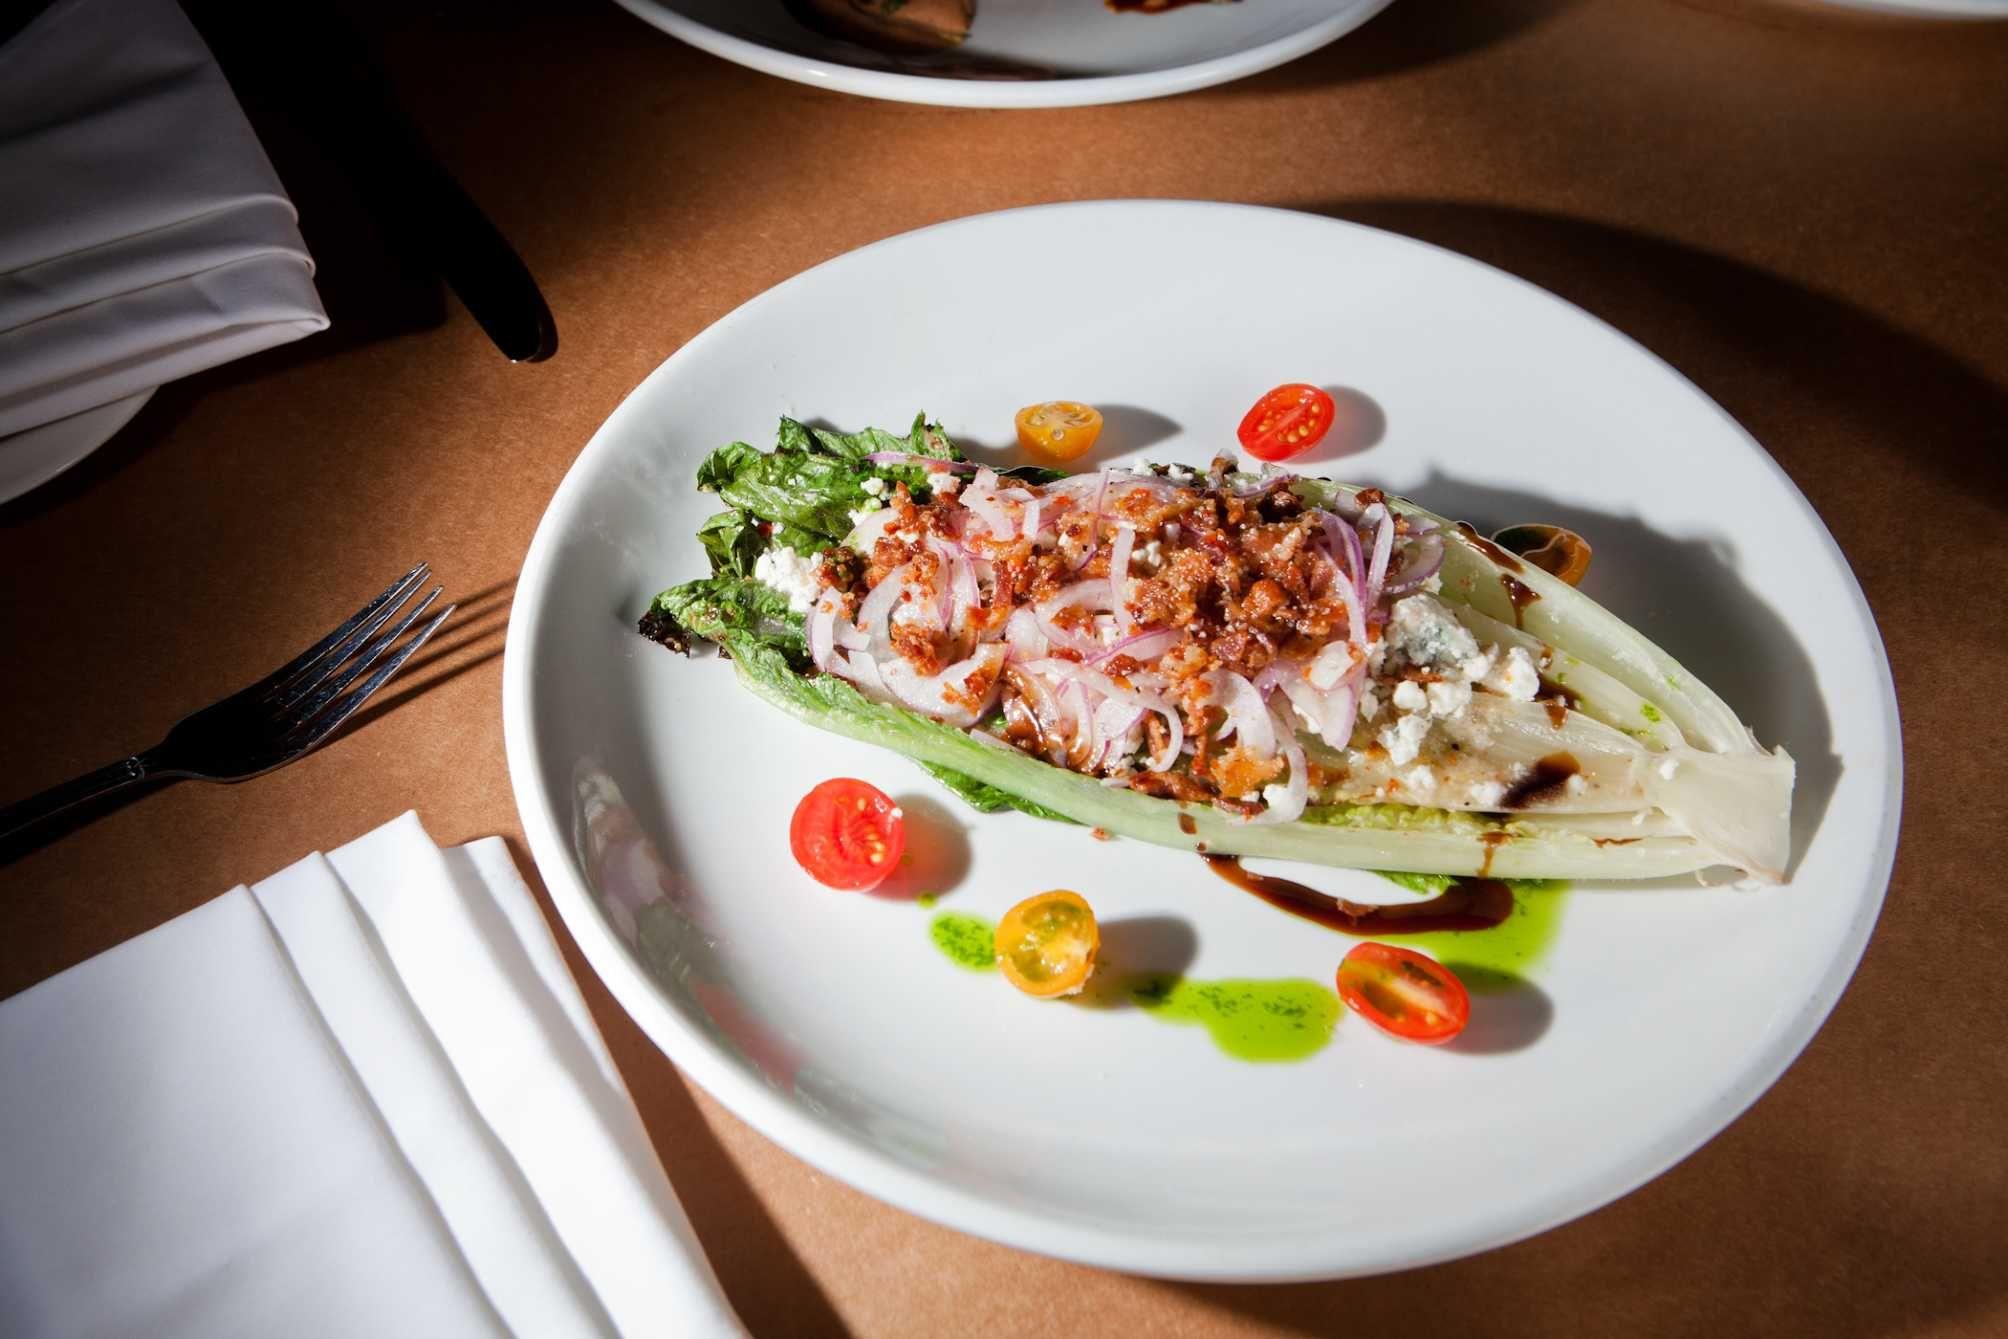 Chadwicks Wedge Salad